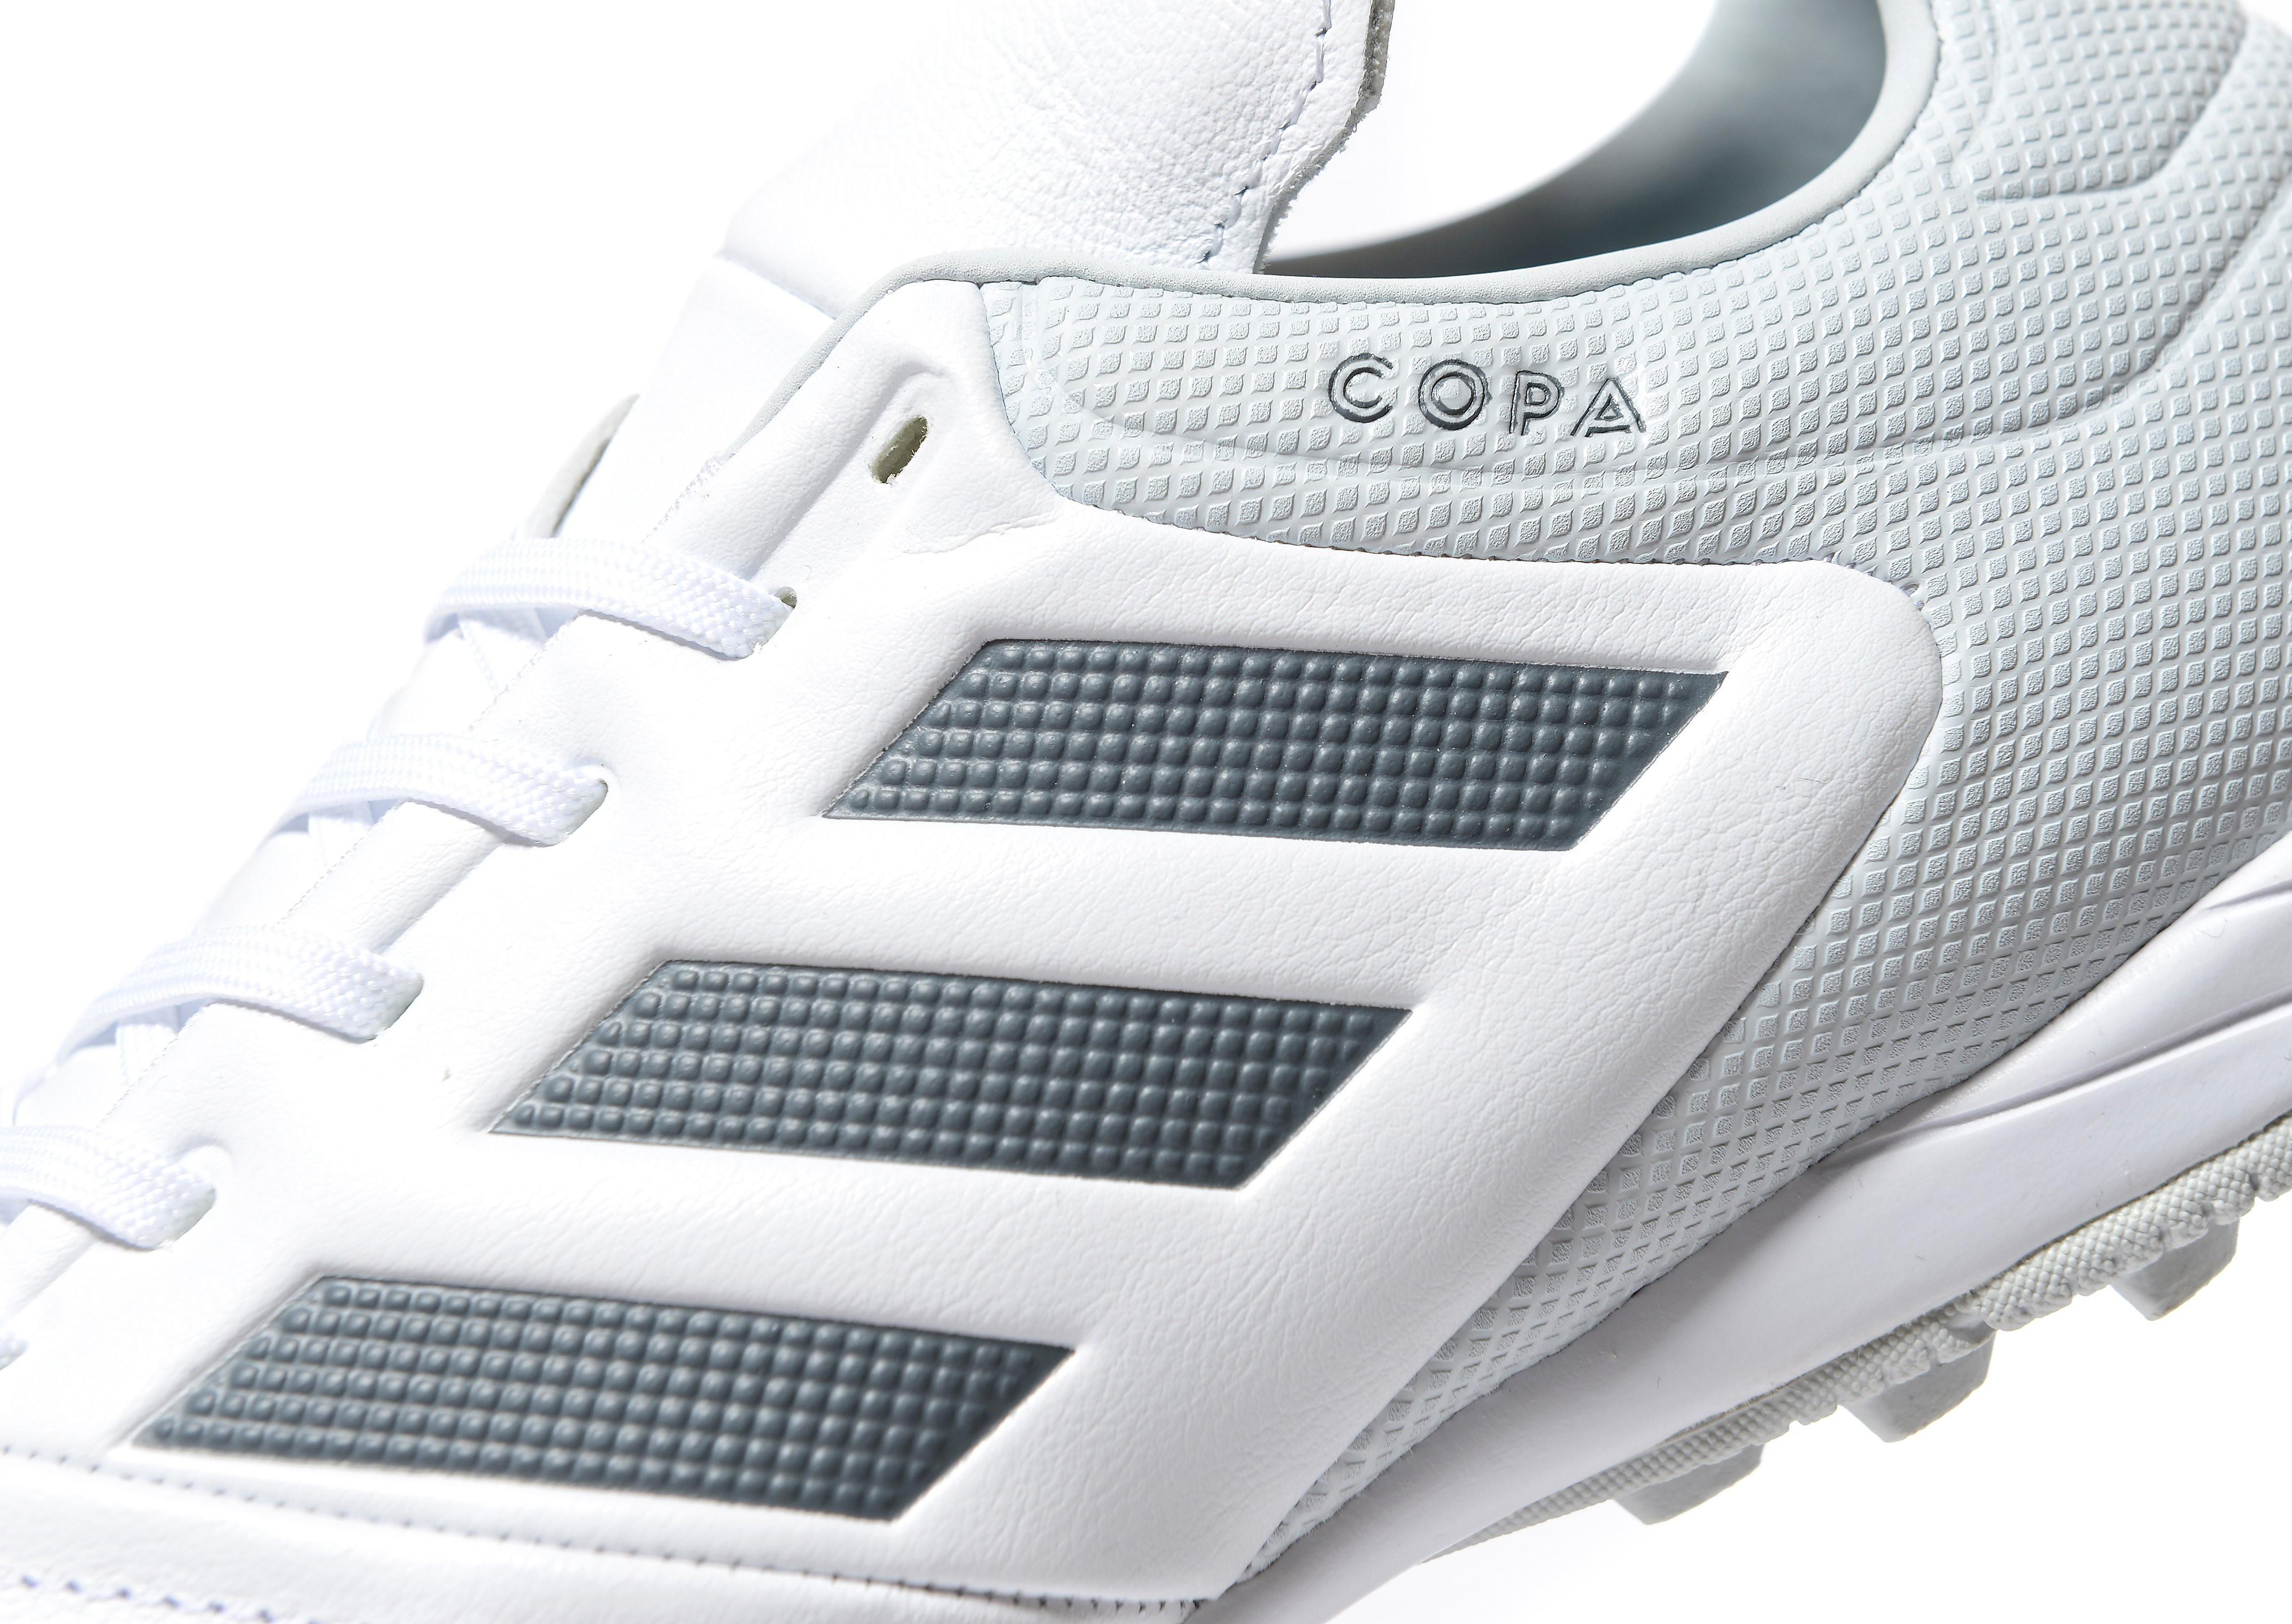 adidas Dust Storm Copa 17.3 Turf